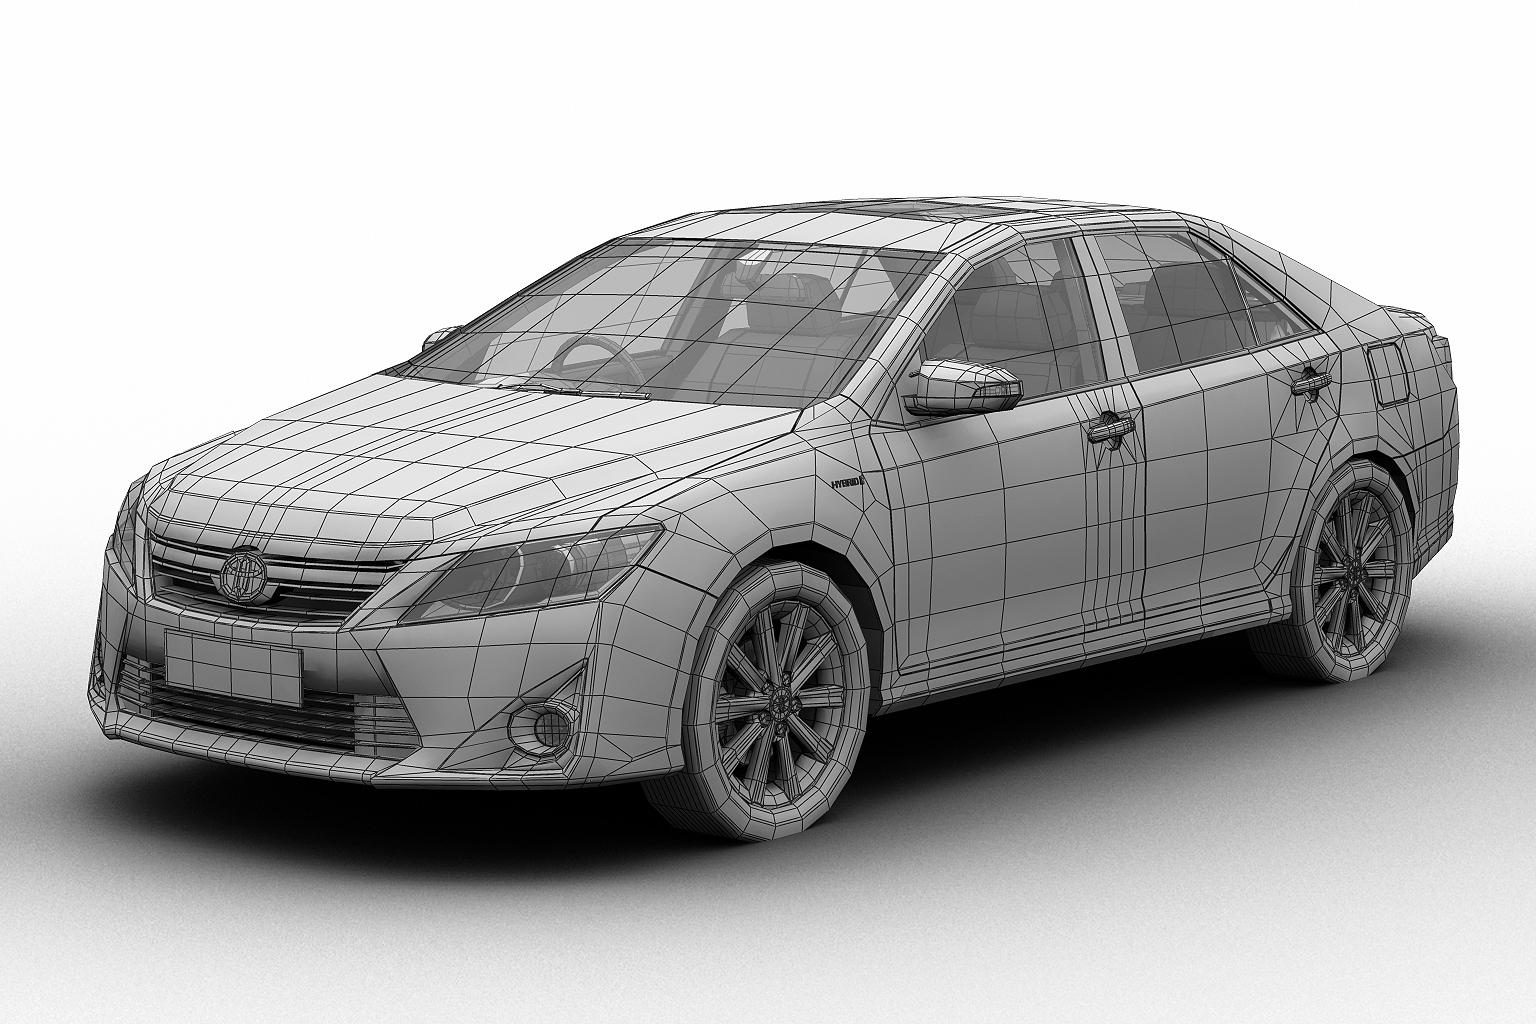 2012 toyota camry model 3d hybrid (asian) 3ds max fbx c4d lwo hrc xsi obj 136190